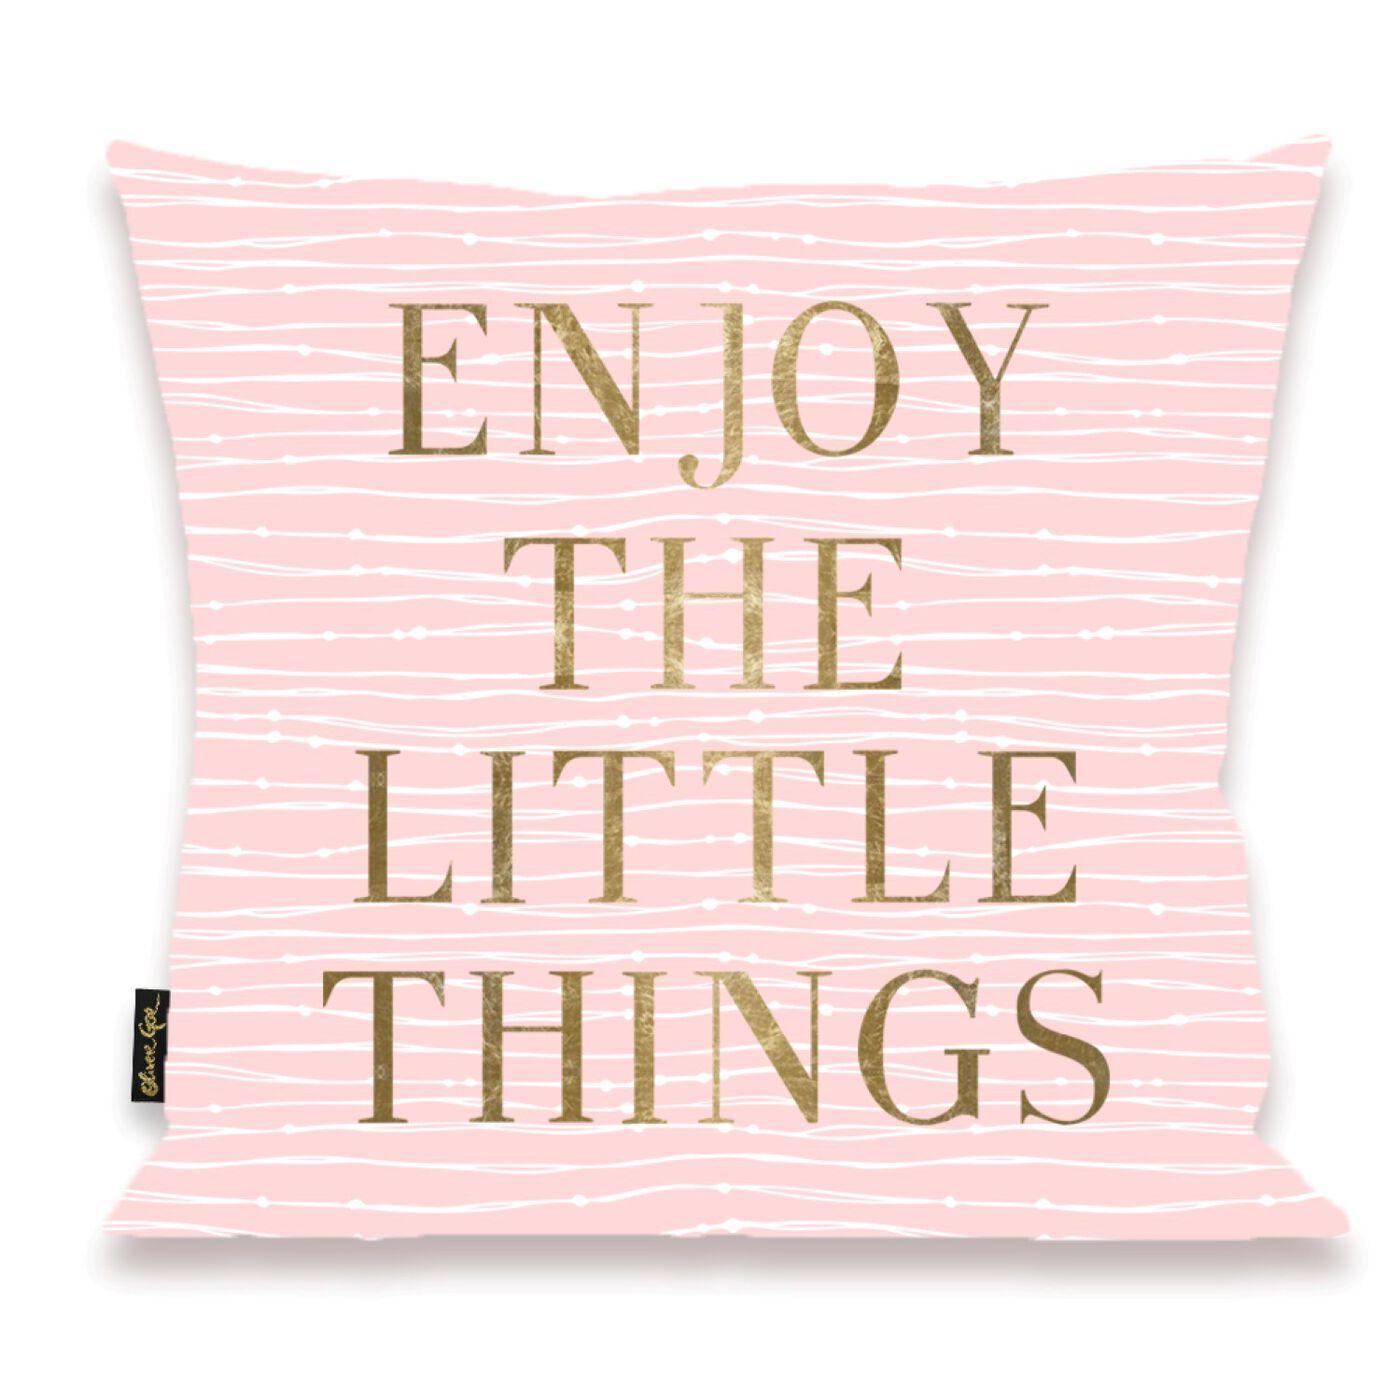 Enjoy Everything Pillow